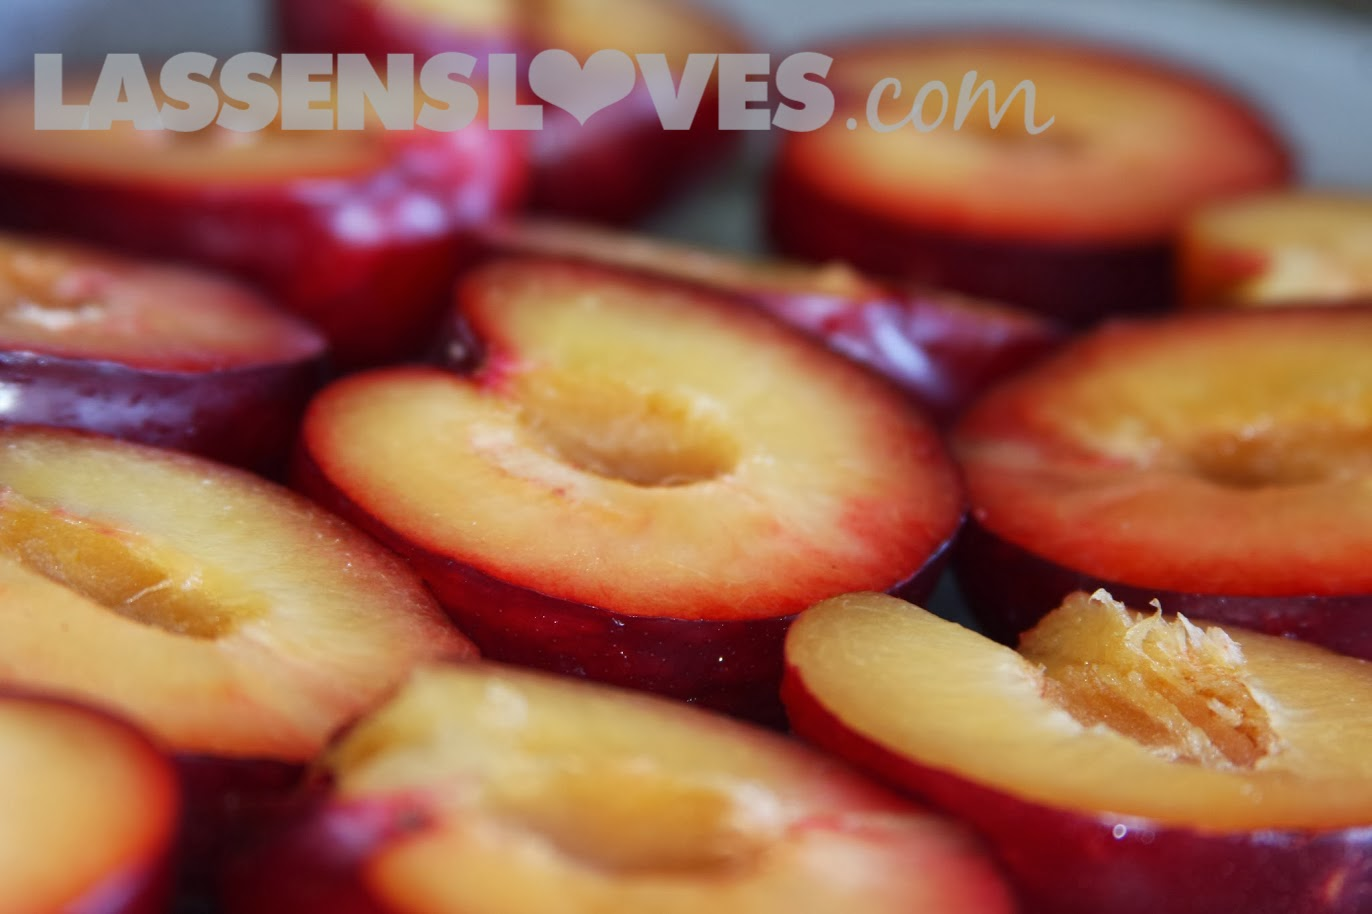 lassensloves.com, Lassen's, Lassens, spiced+baked+plums, organic+plums